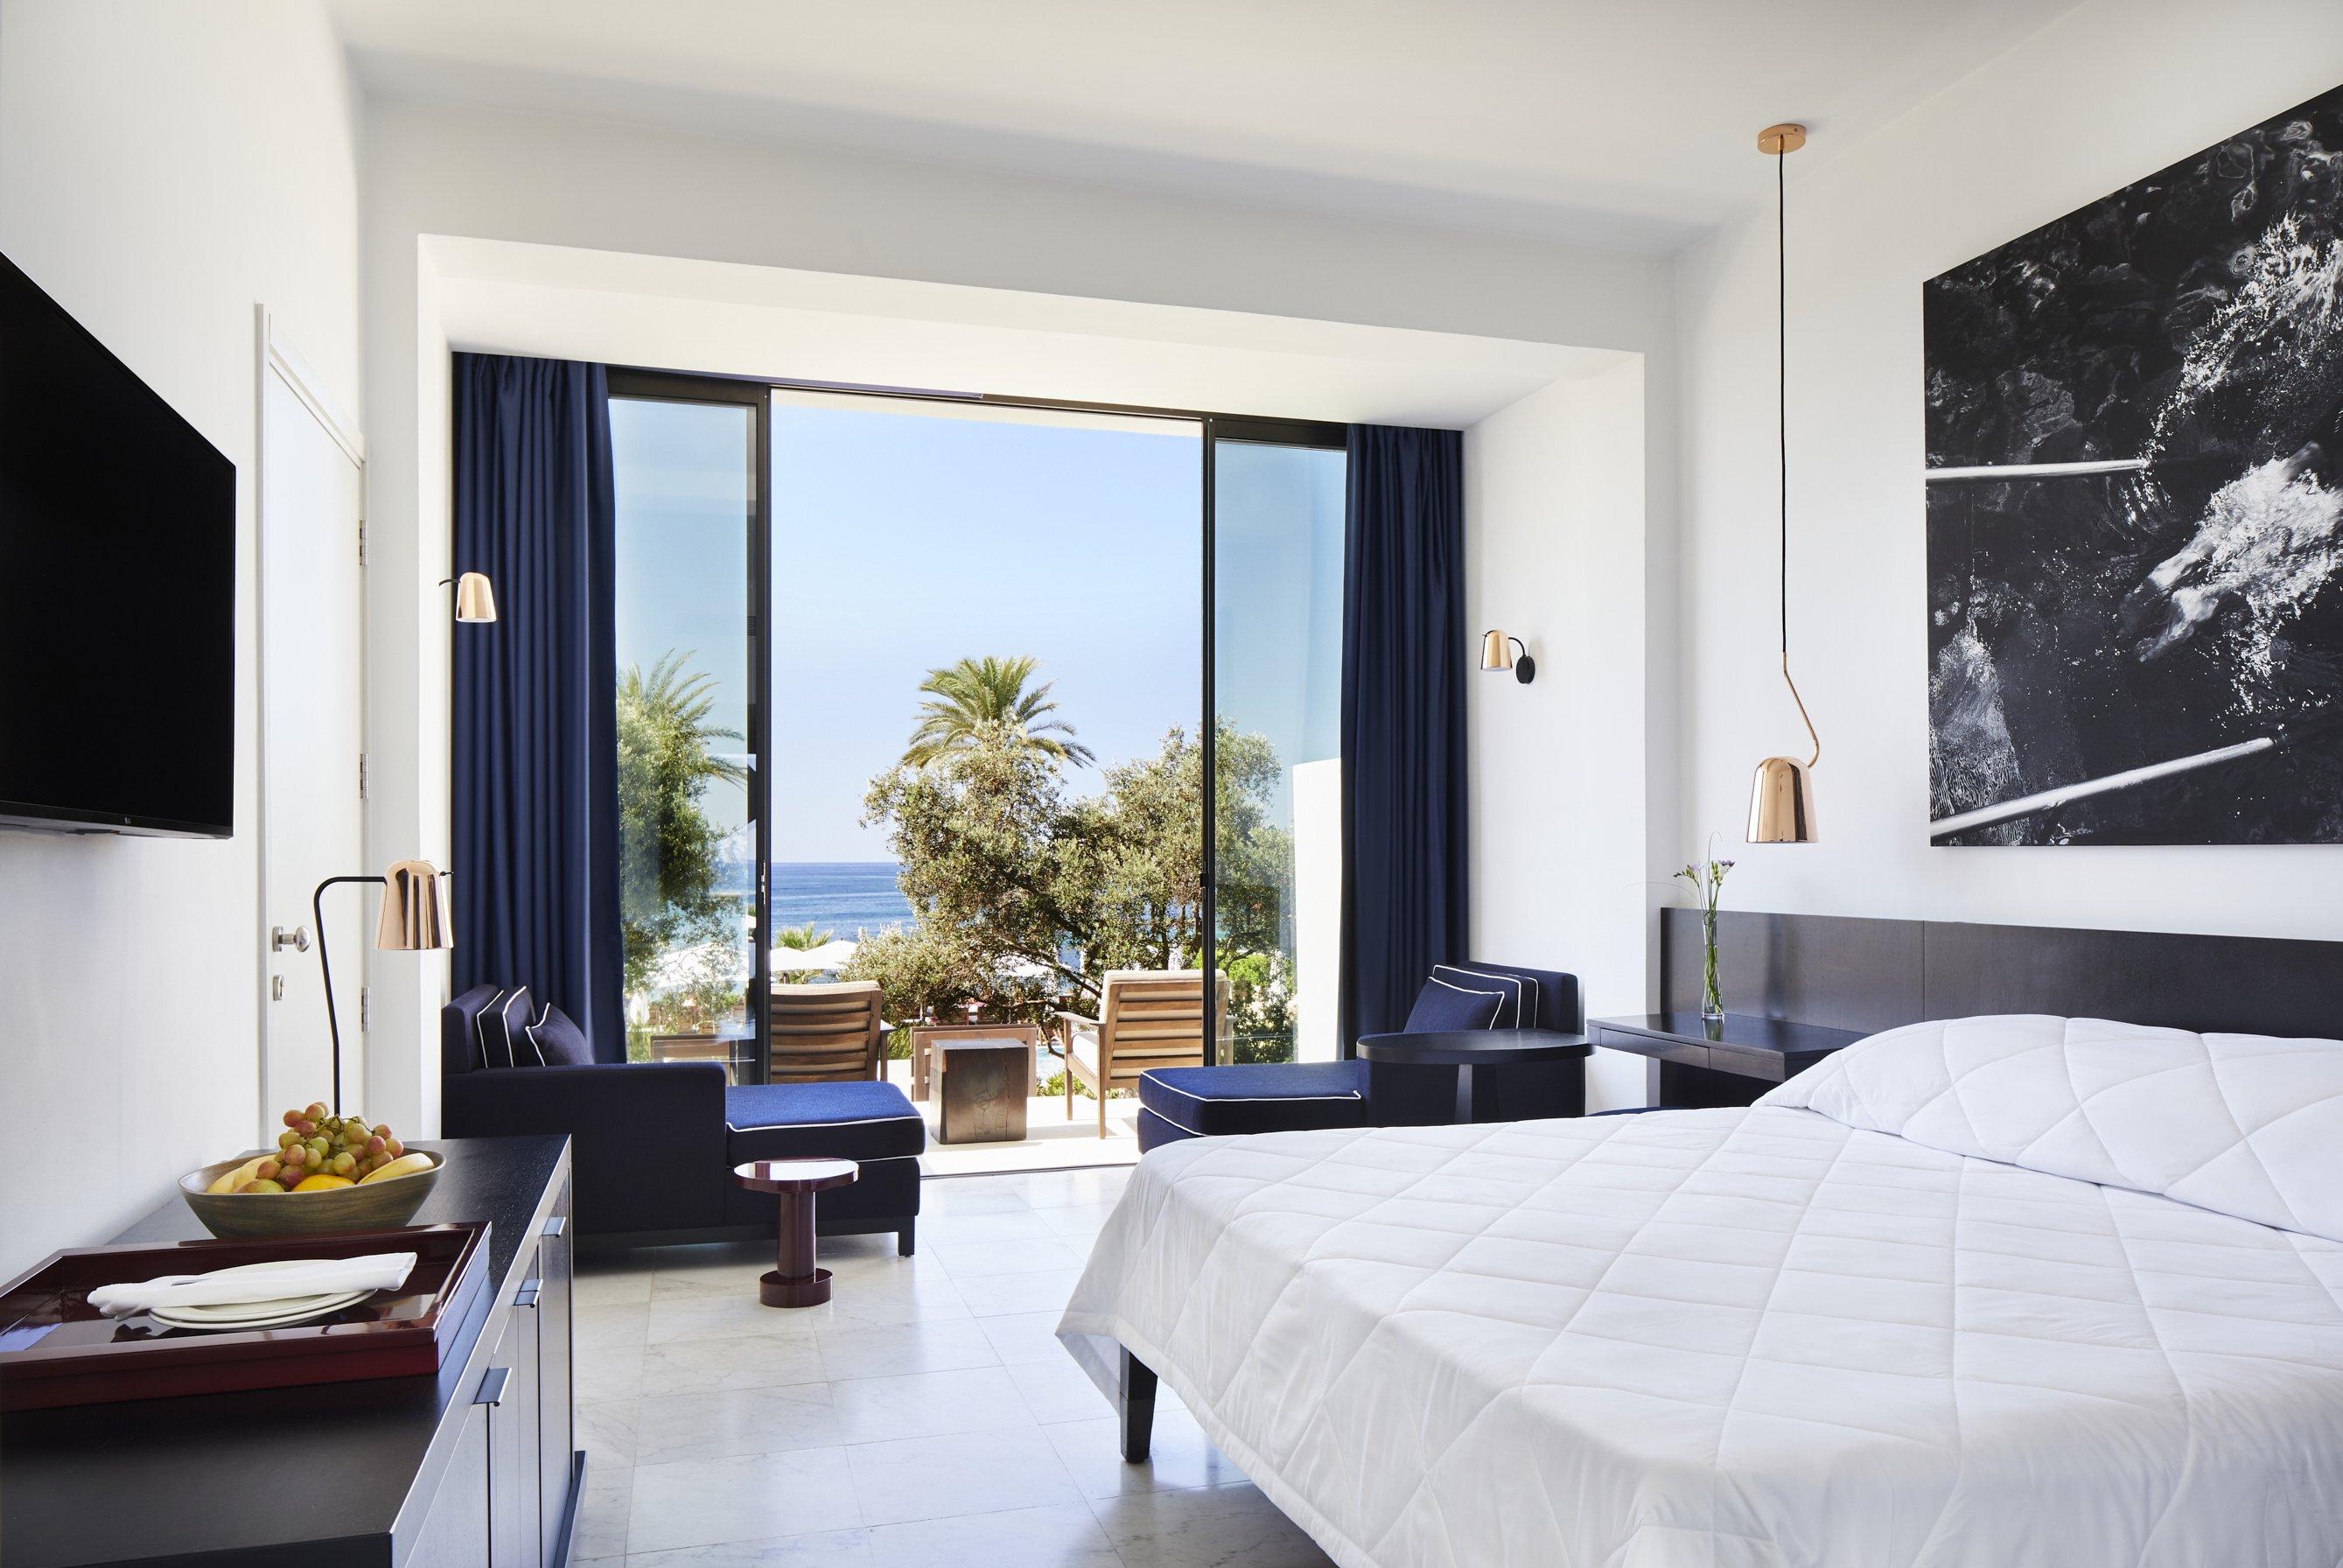 Almyra Hotel, a Design Hotel